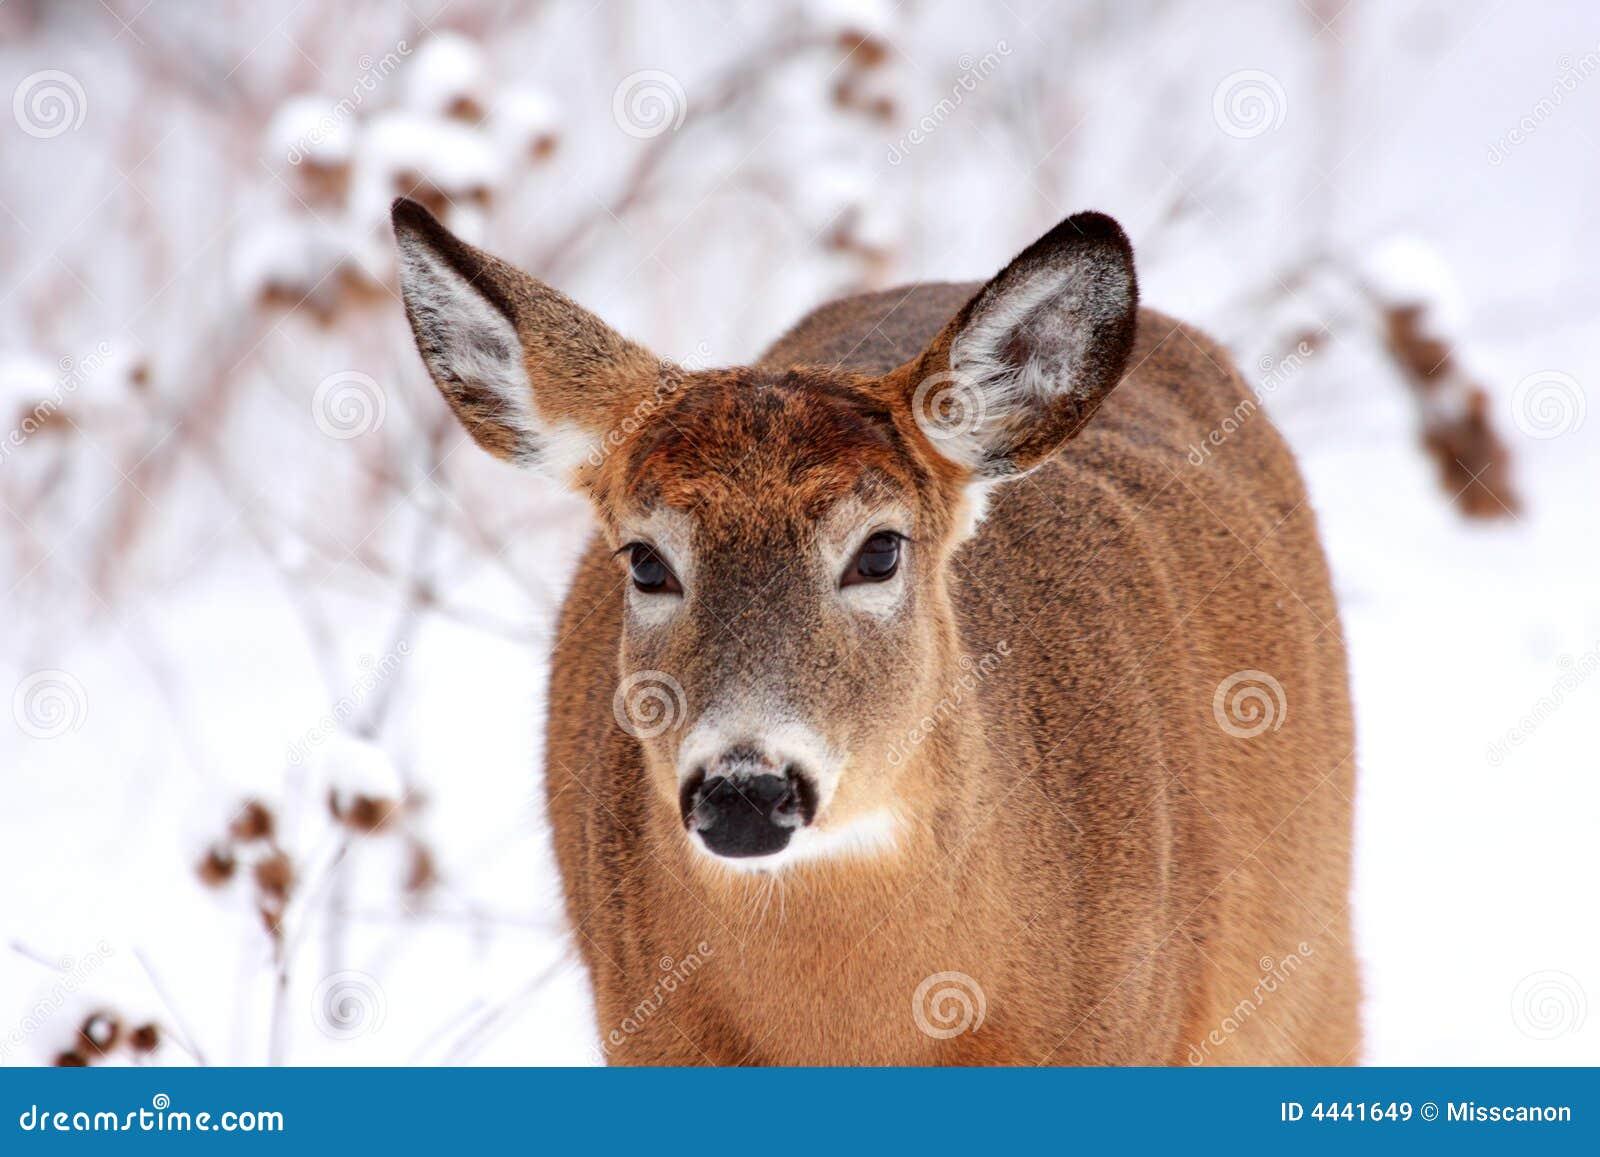 Beautiful deer in winter